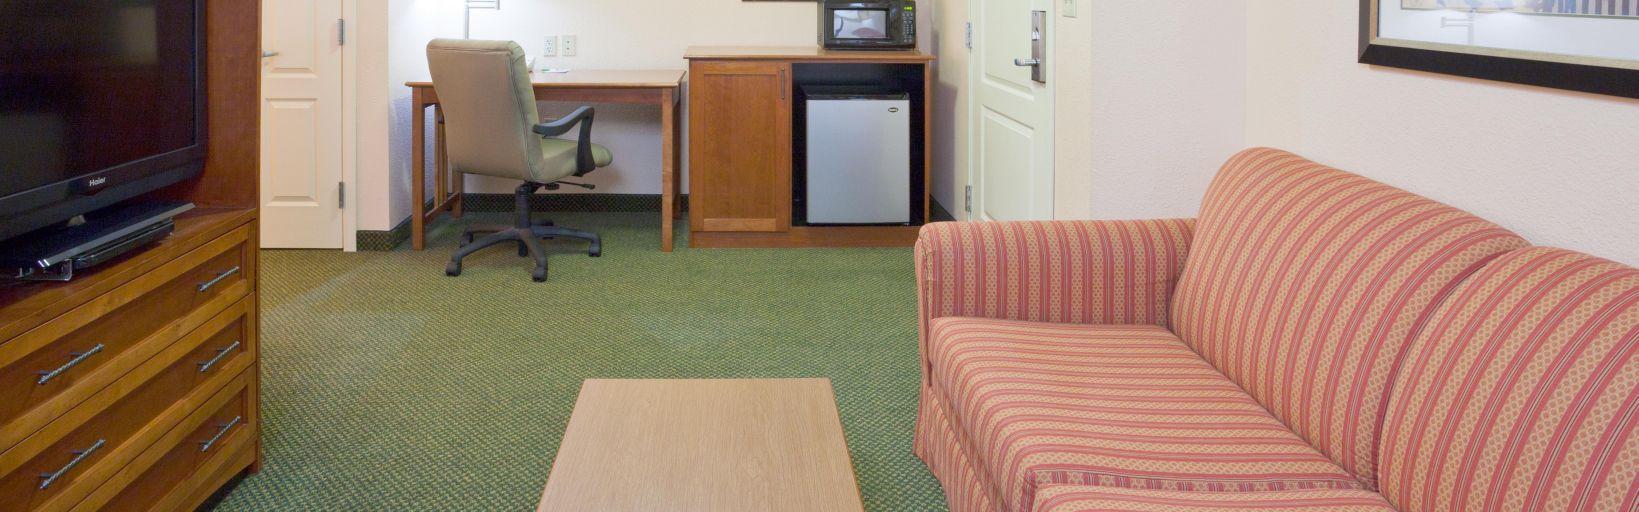 Holiday Inn Elk River Hotel Executive Suite Living Room